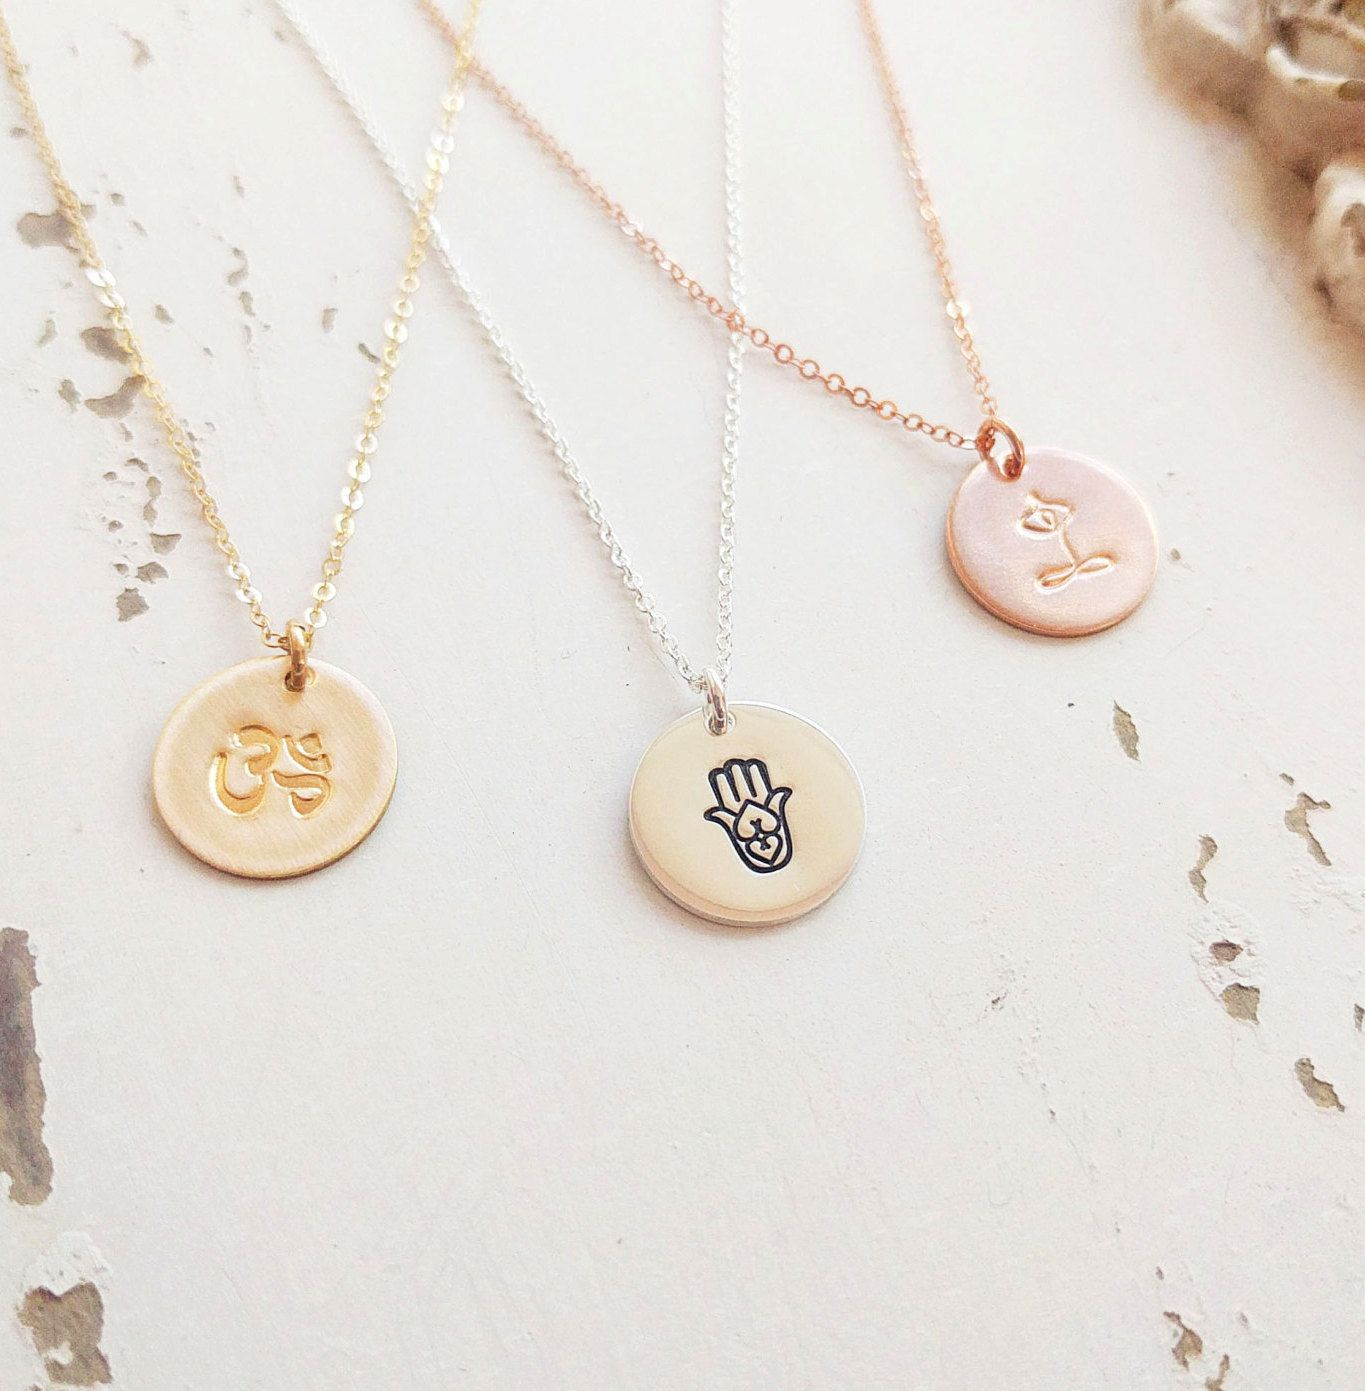 Yoga necklace spiritual jewelry yoga jewelry namaste necklace om yoga necklace spiritual jewelry yoga jewelry namaste necklace om necklace hamsa mozeypictures Choice Image